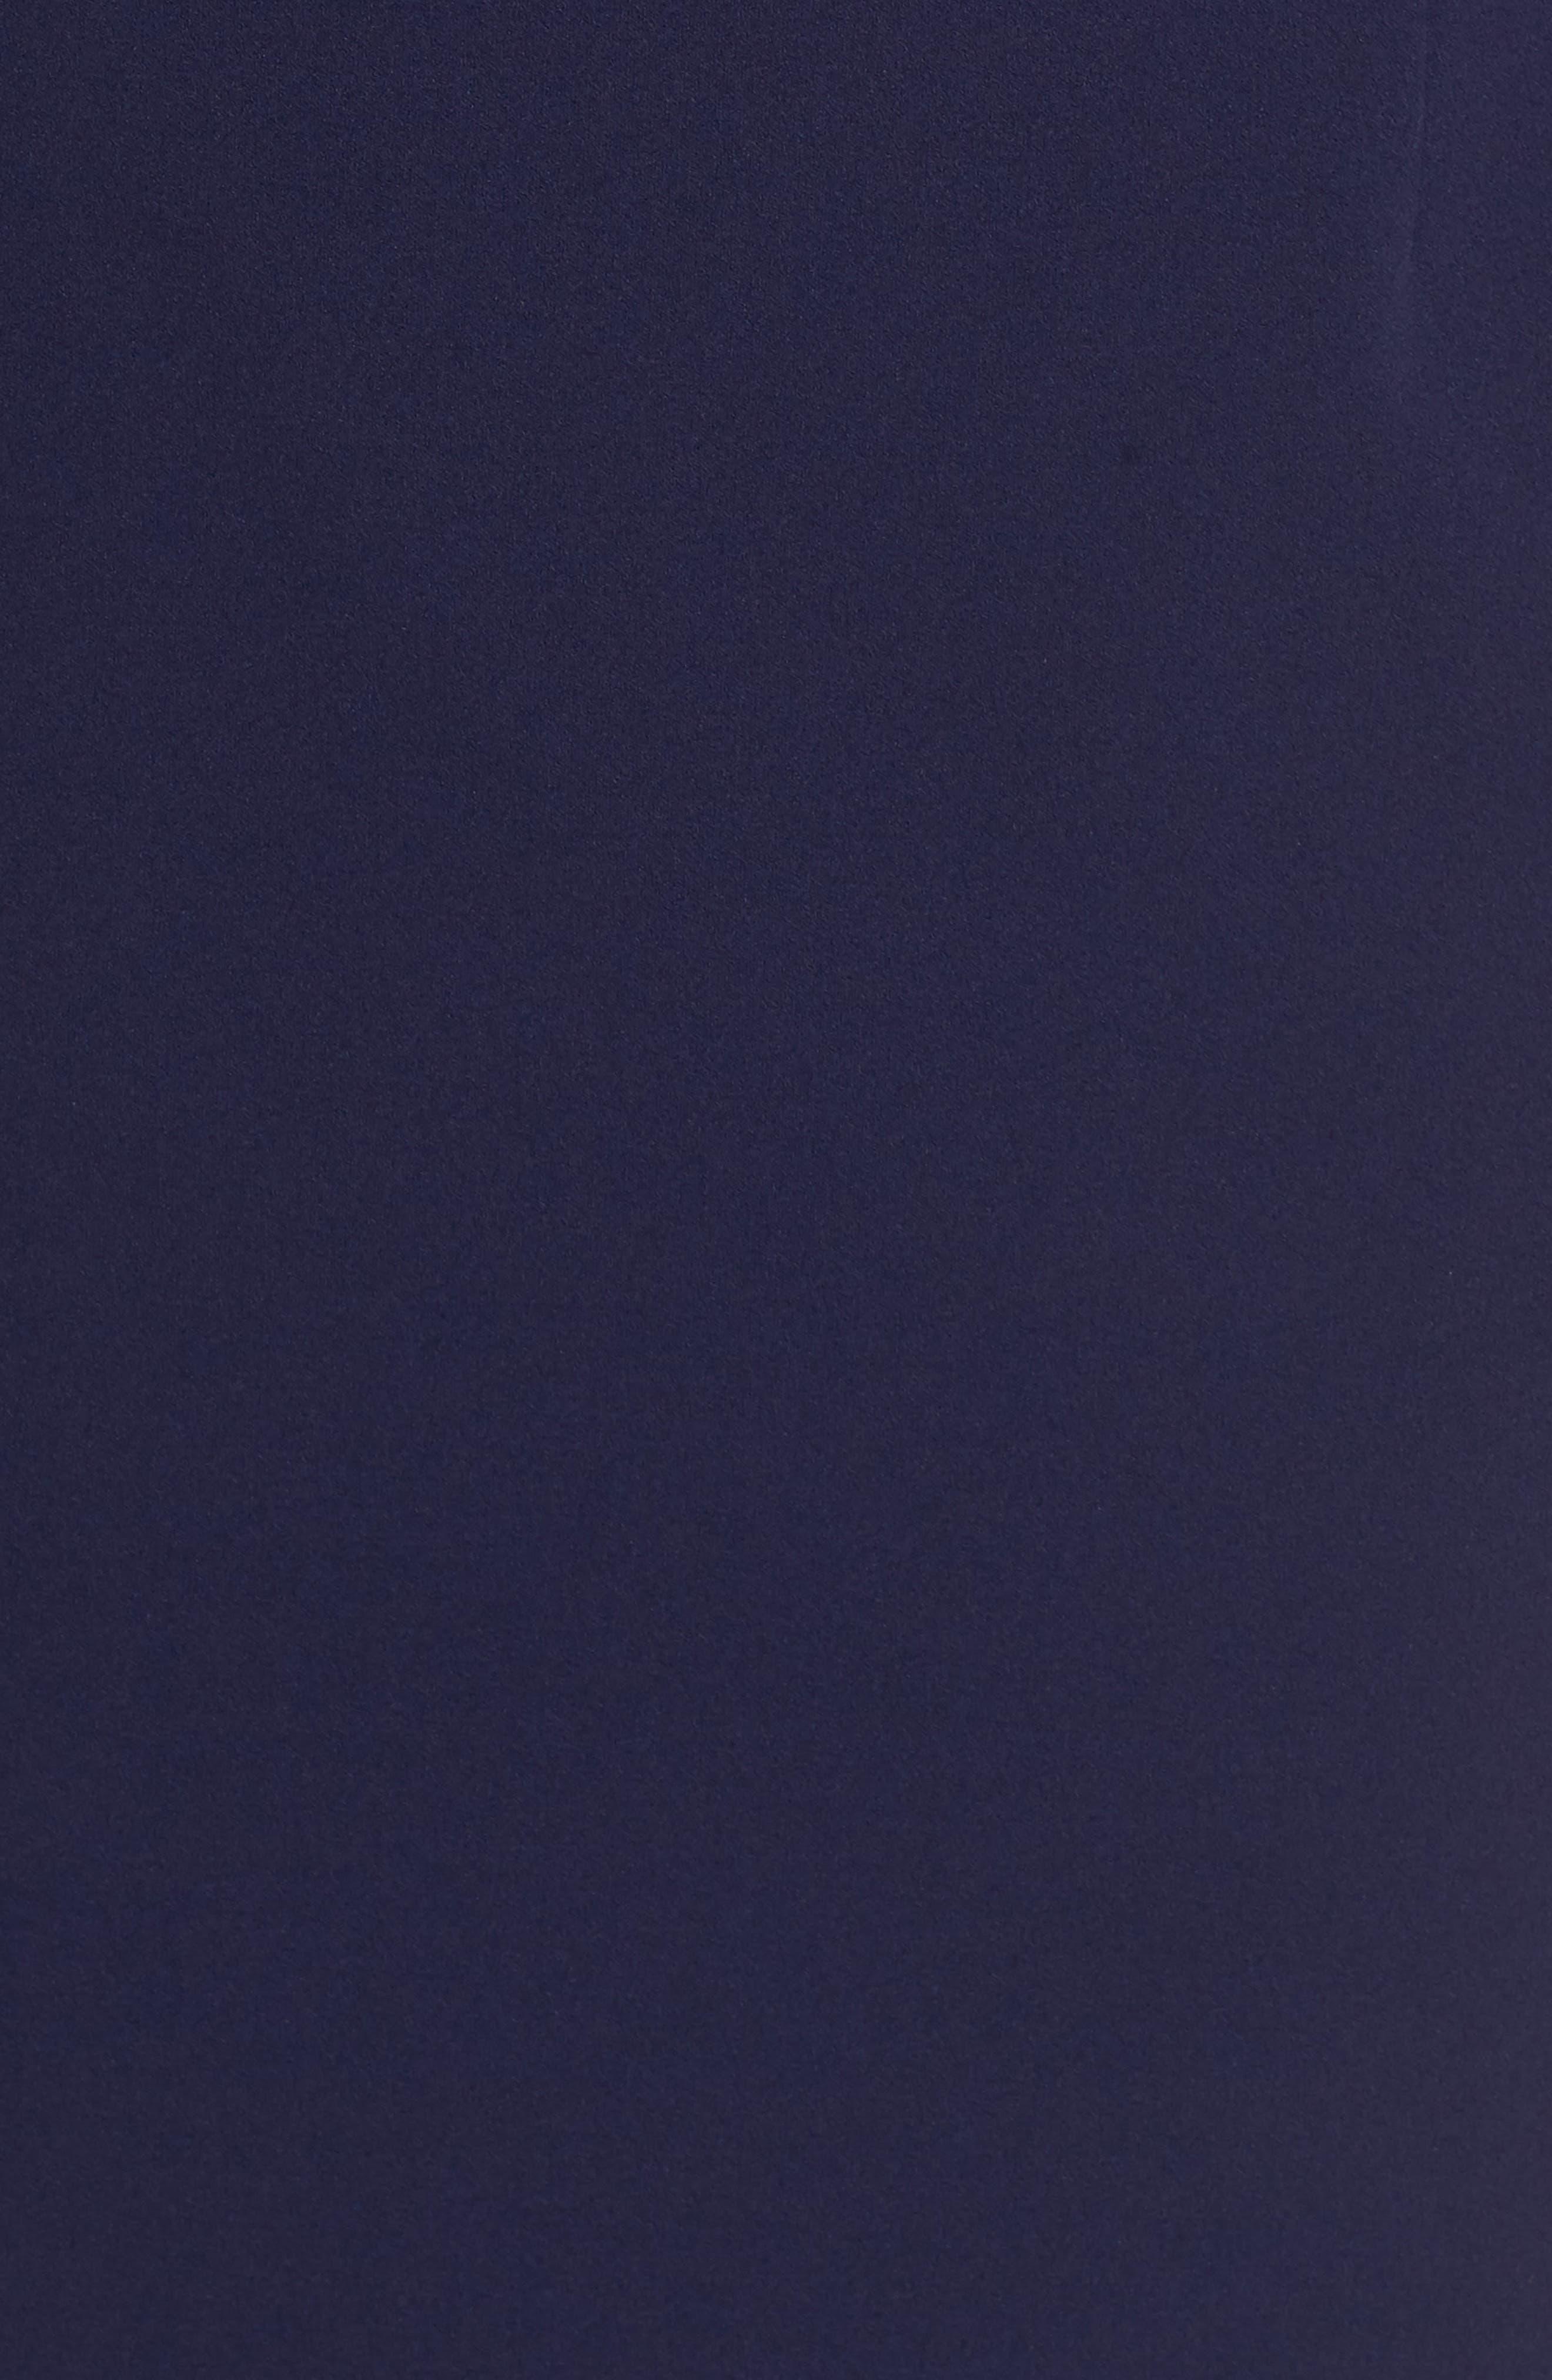 VINCE CAMUTO, Embellished Neck Sheath Dress, Alternate thumbnail 6, color, NAVY